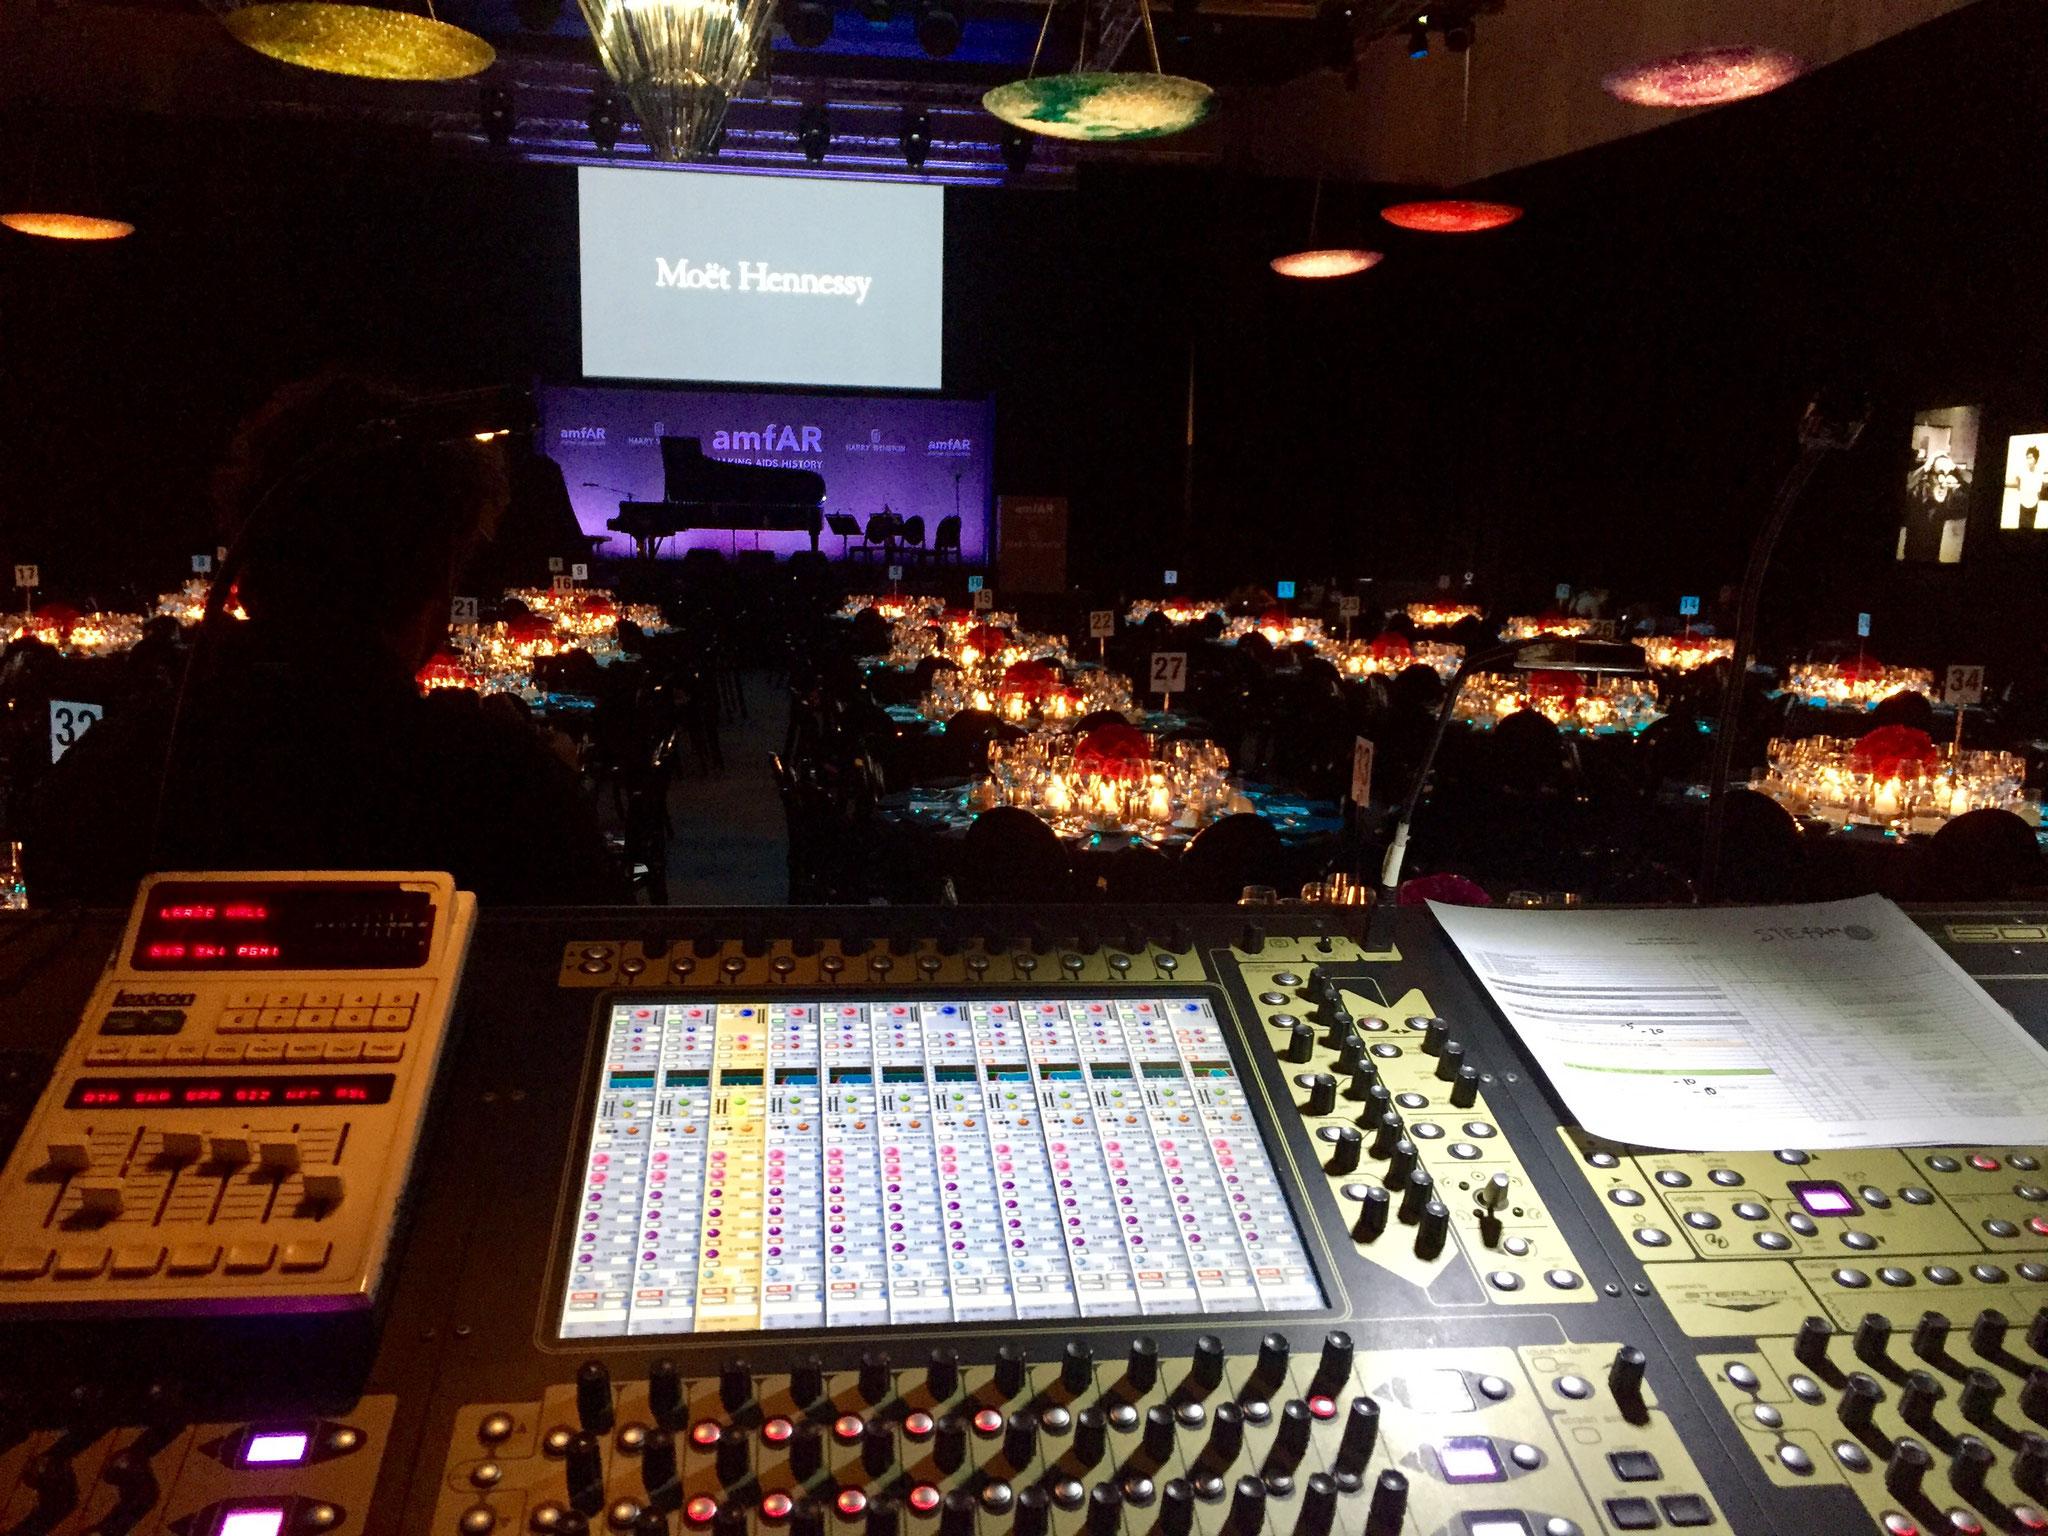 AMFAR MILANO 2017 - AudioProject - FOH